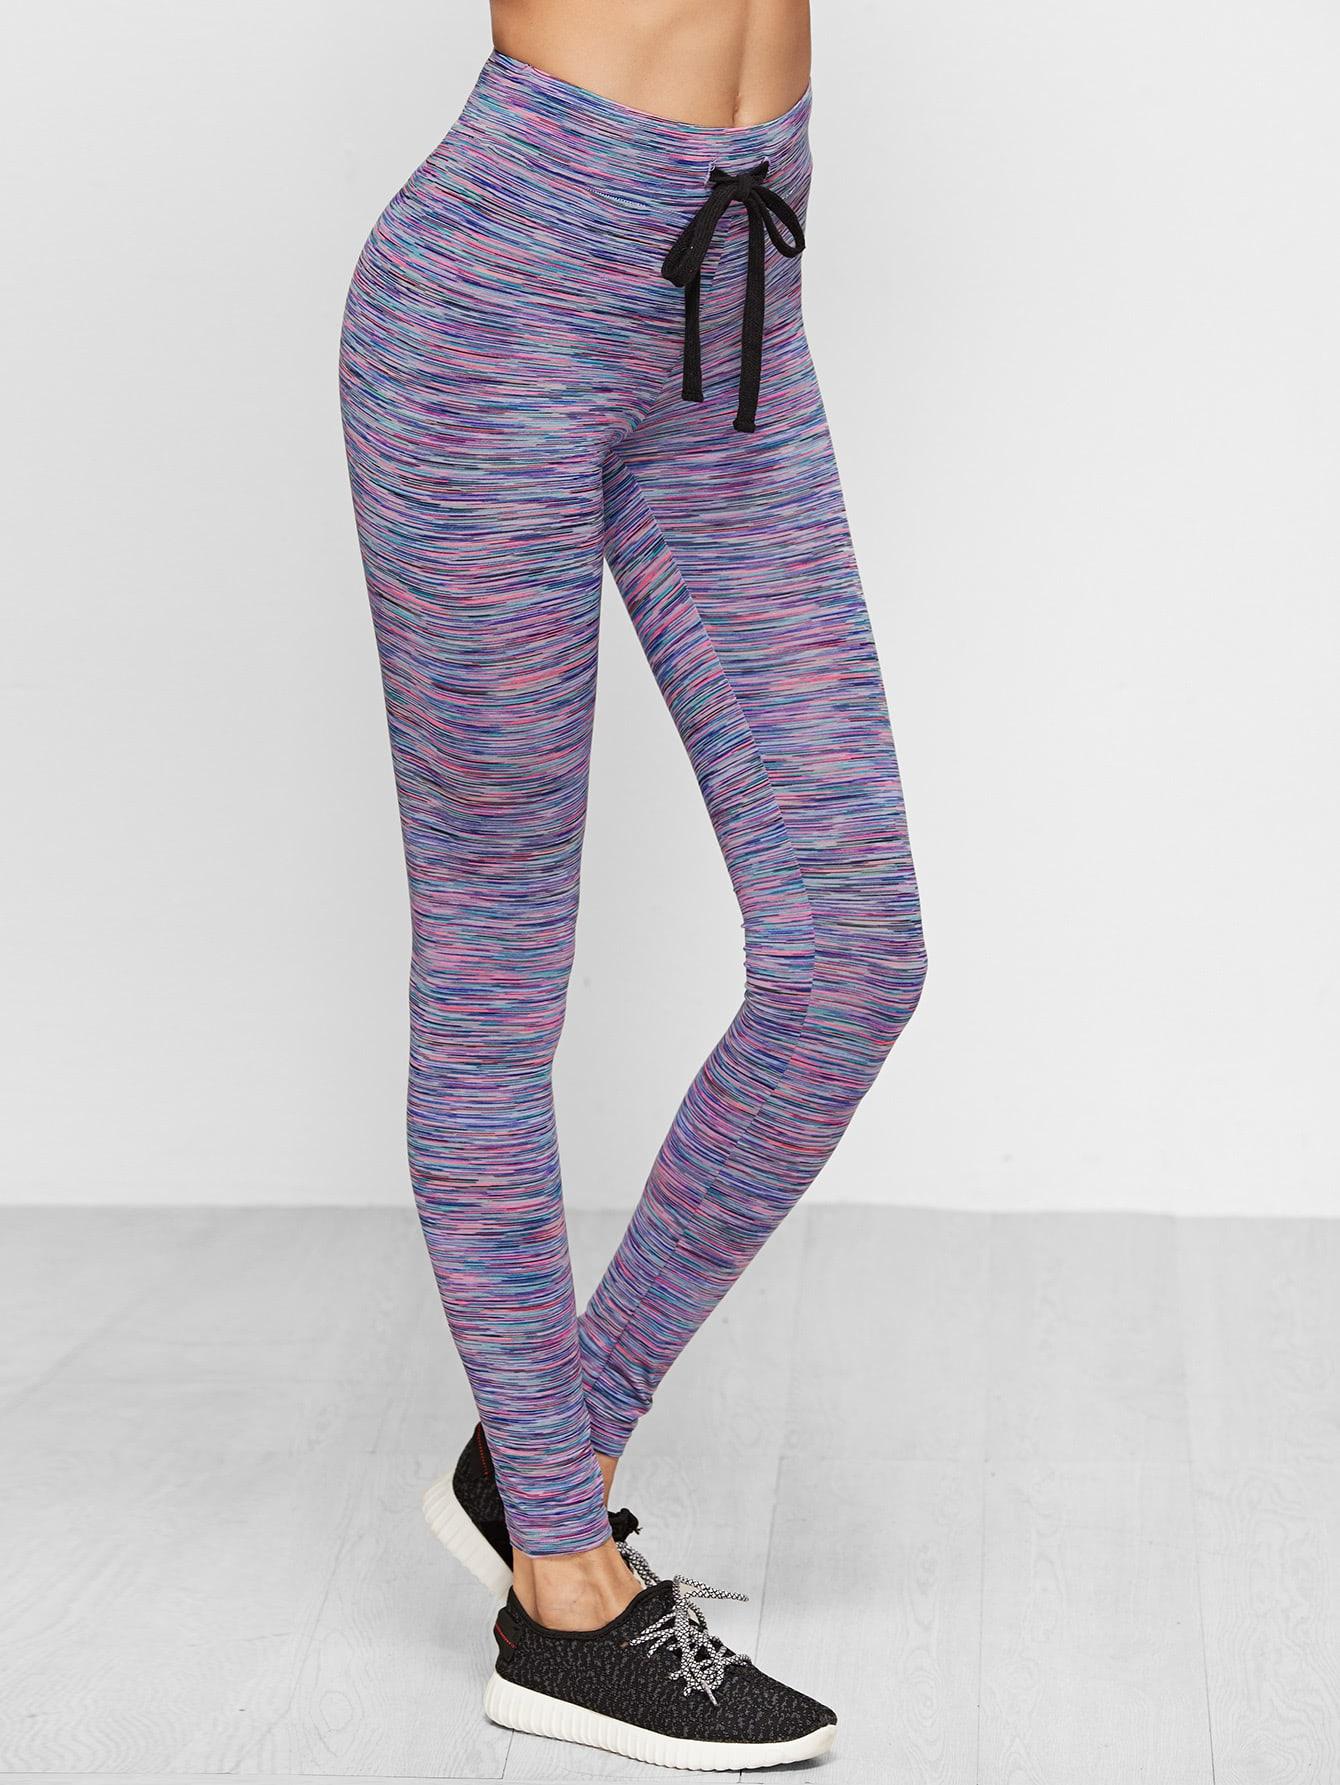 http://www.romwe.com/Purple-Marled-Knit-Drawstring-Waist-Leggings-p-211090-cat-683.html